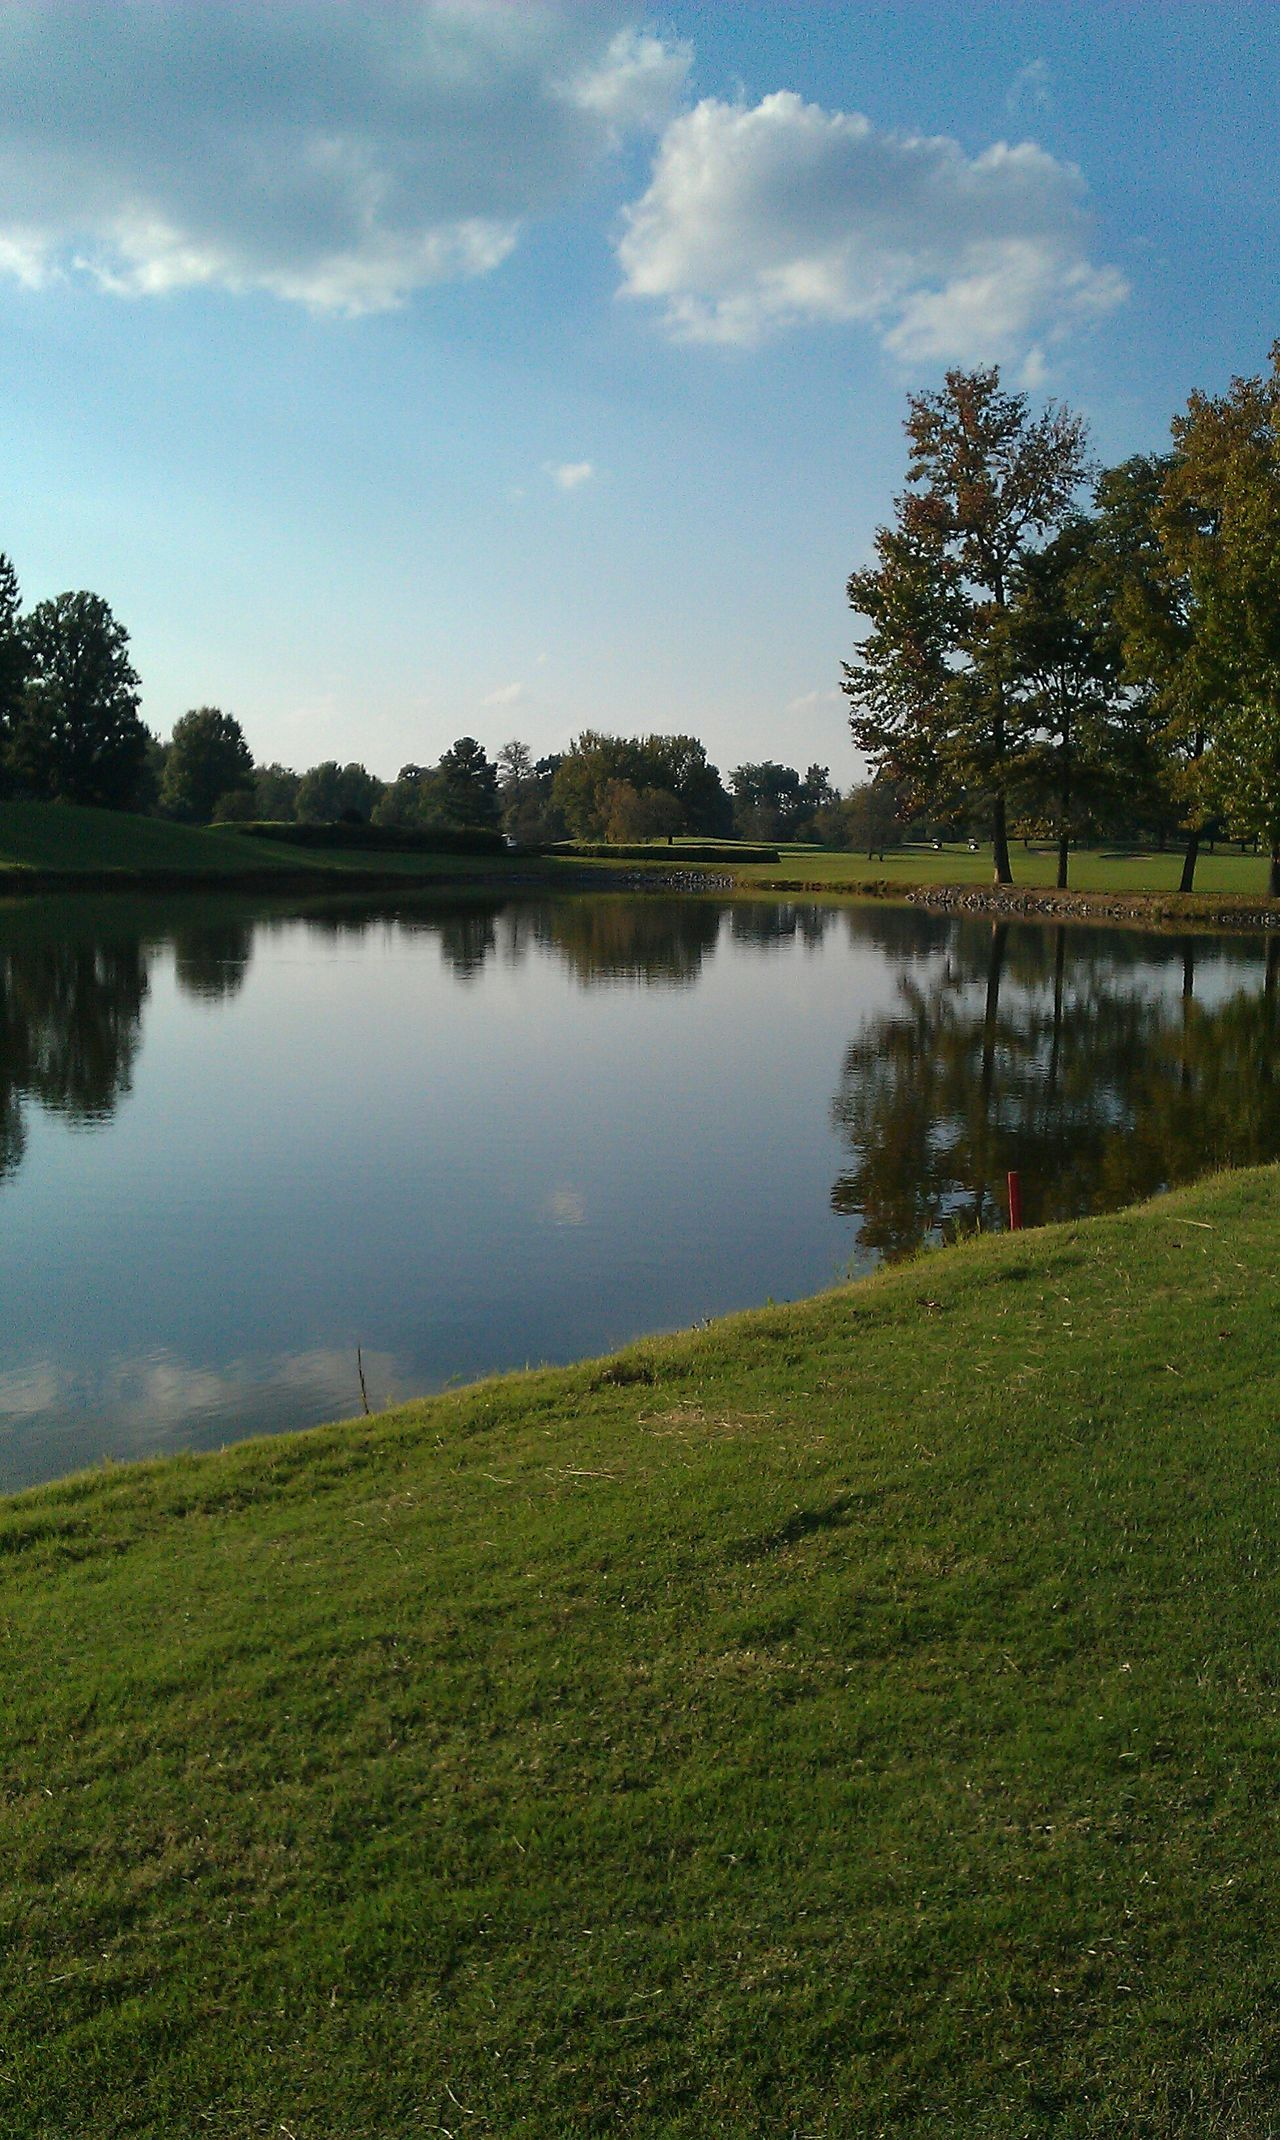 Golfing The Grass Is Green Golf Course Reflection Beautiful Day EyeEm Best Shots EyeEm Best Shots - Nature Landscape_photography Green